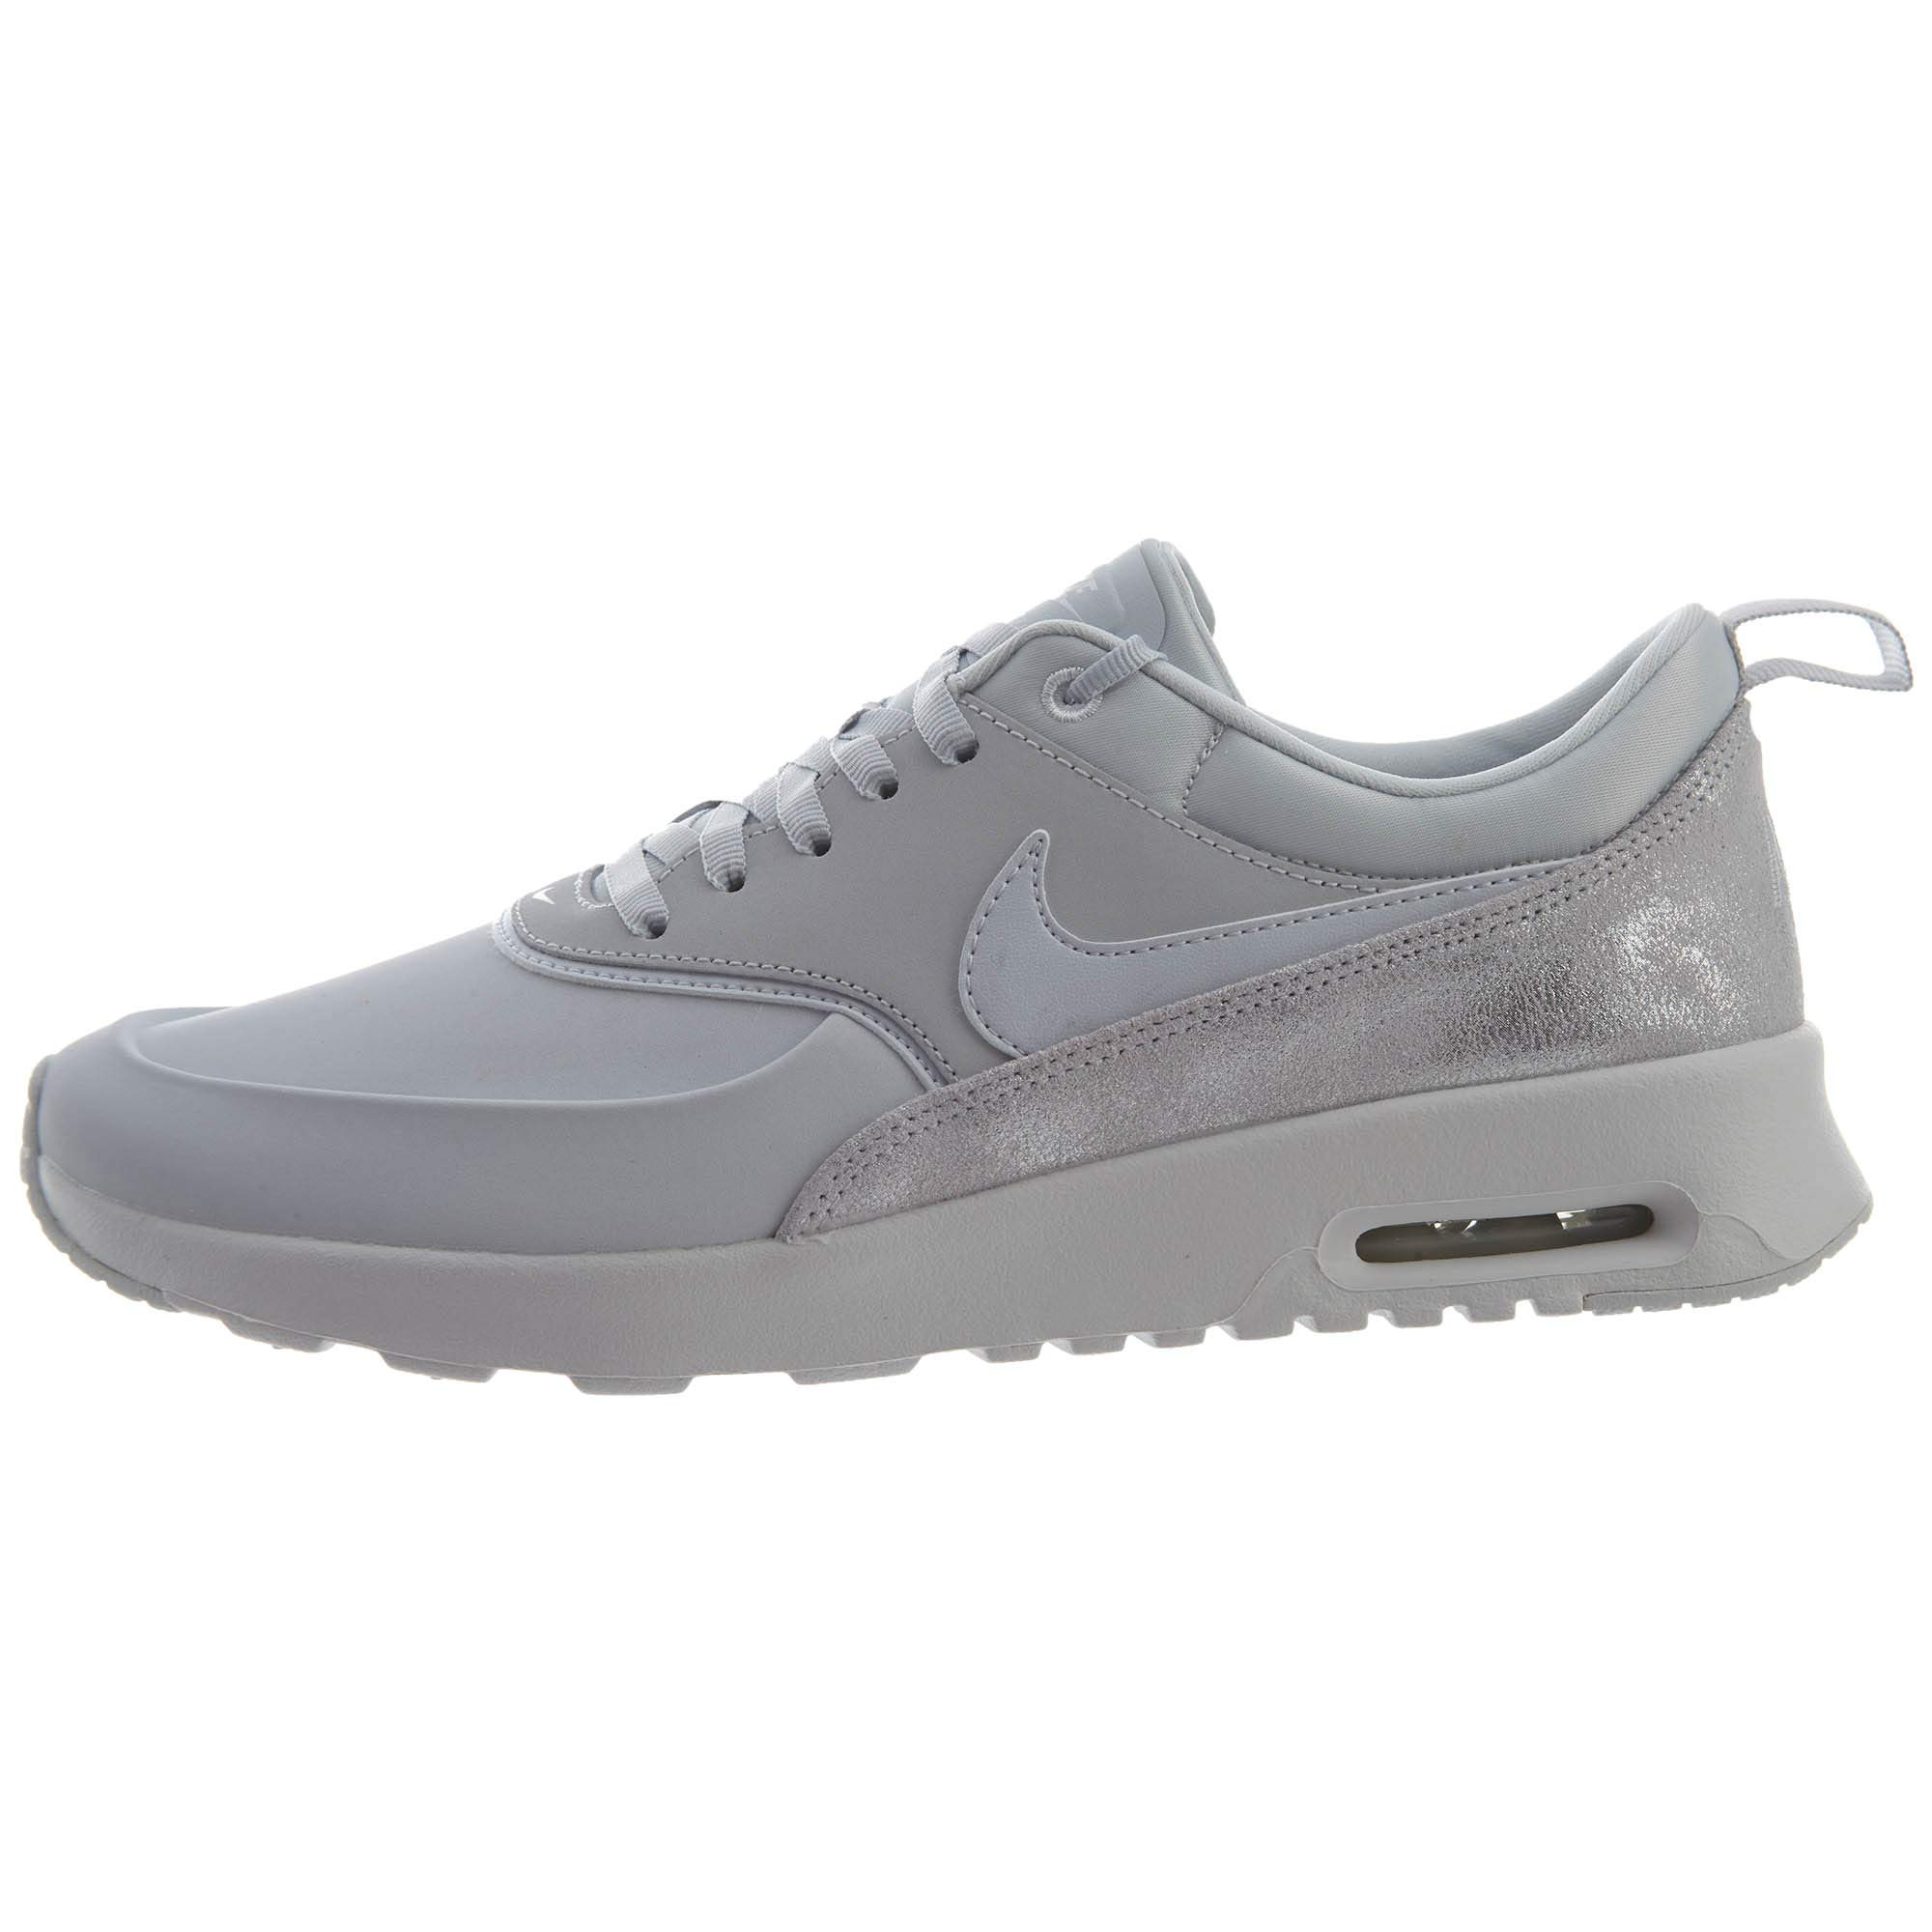 f113053f40 Galleon - Nike Women's Air Max Thea PRM Pure Platinum/Pure Platinum Running  Shoe 6 Women US